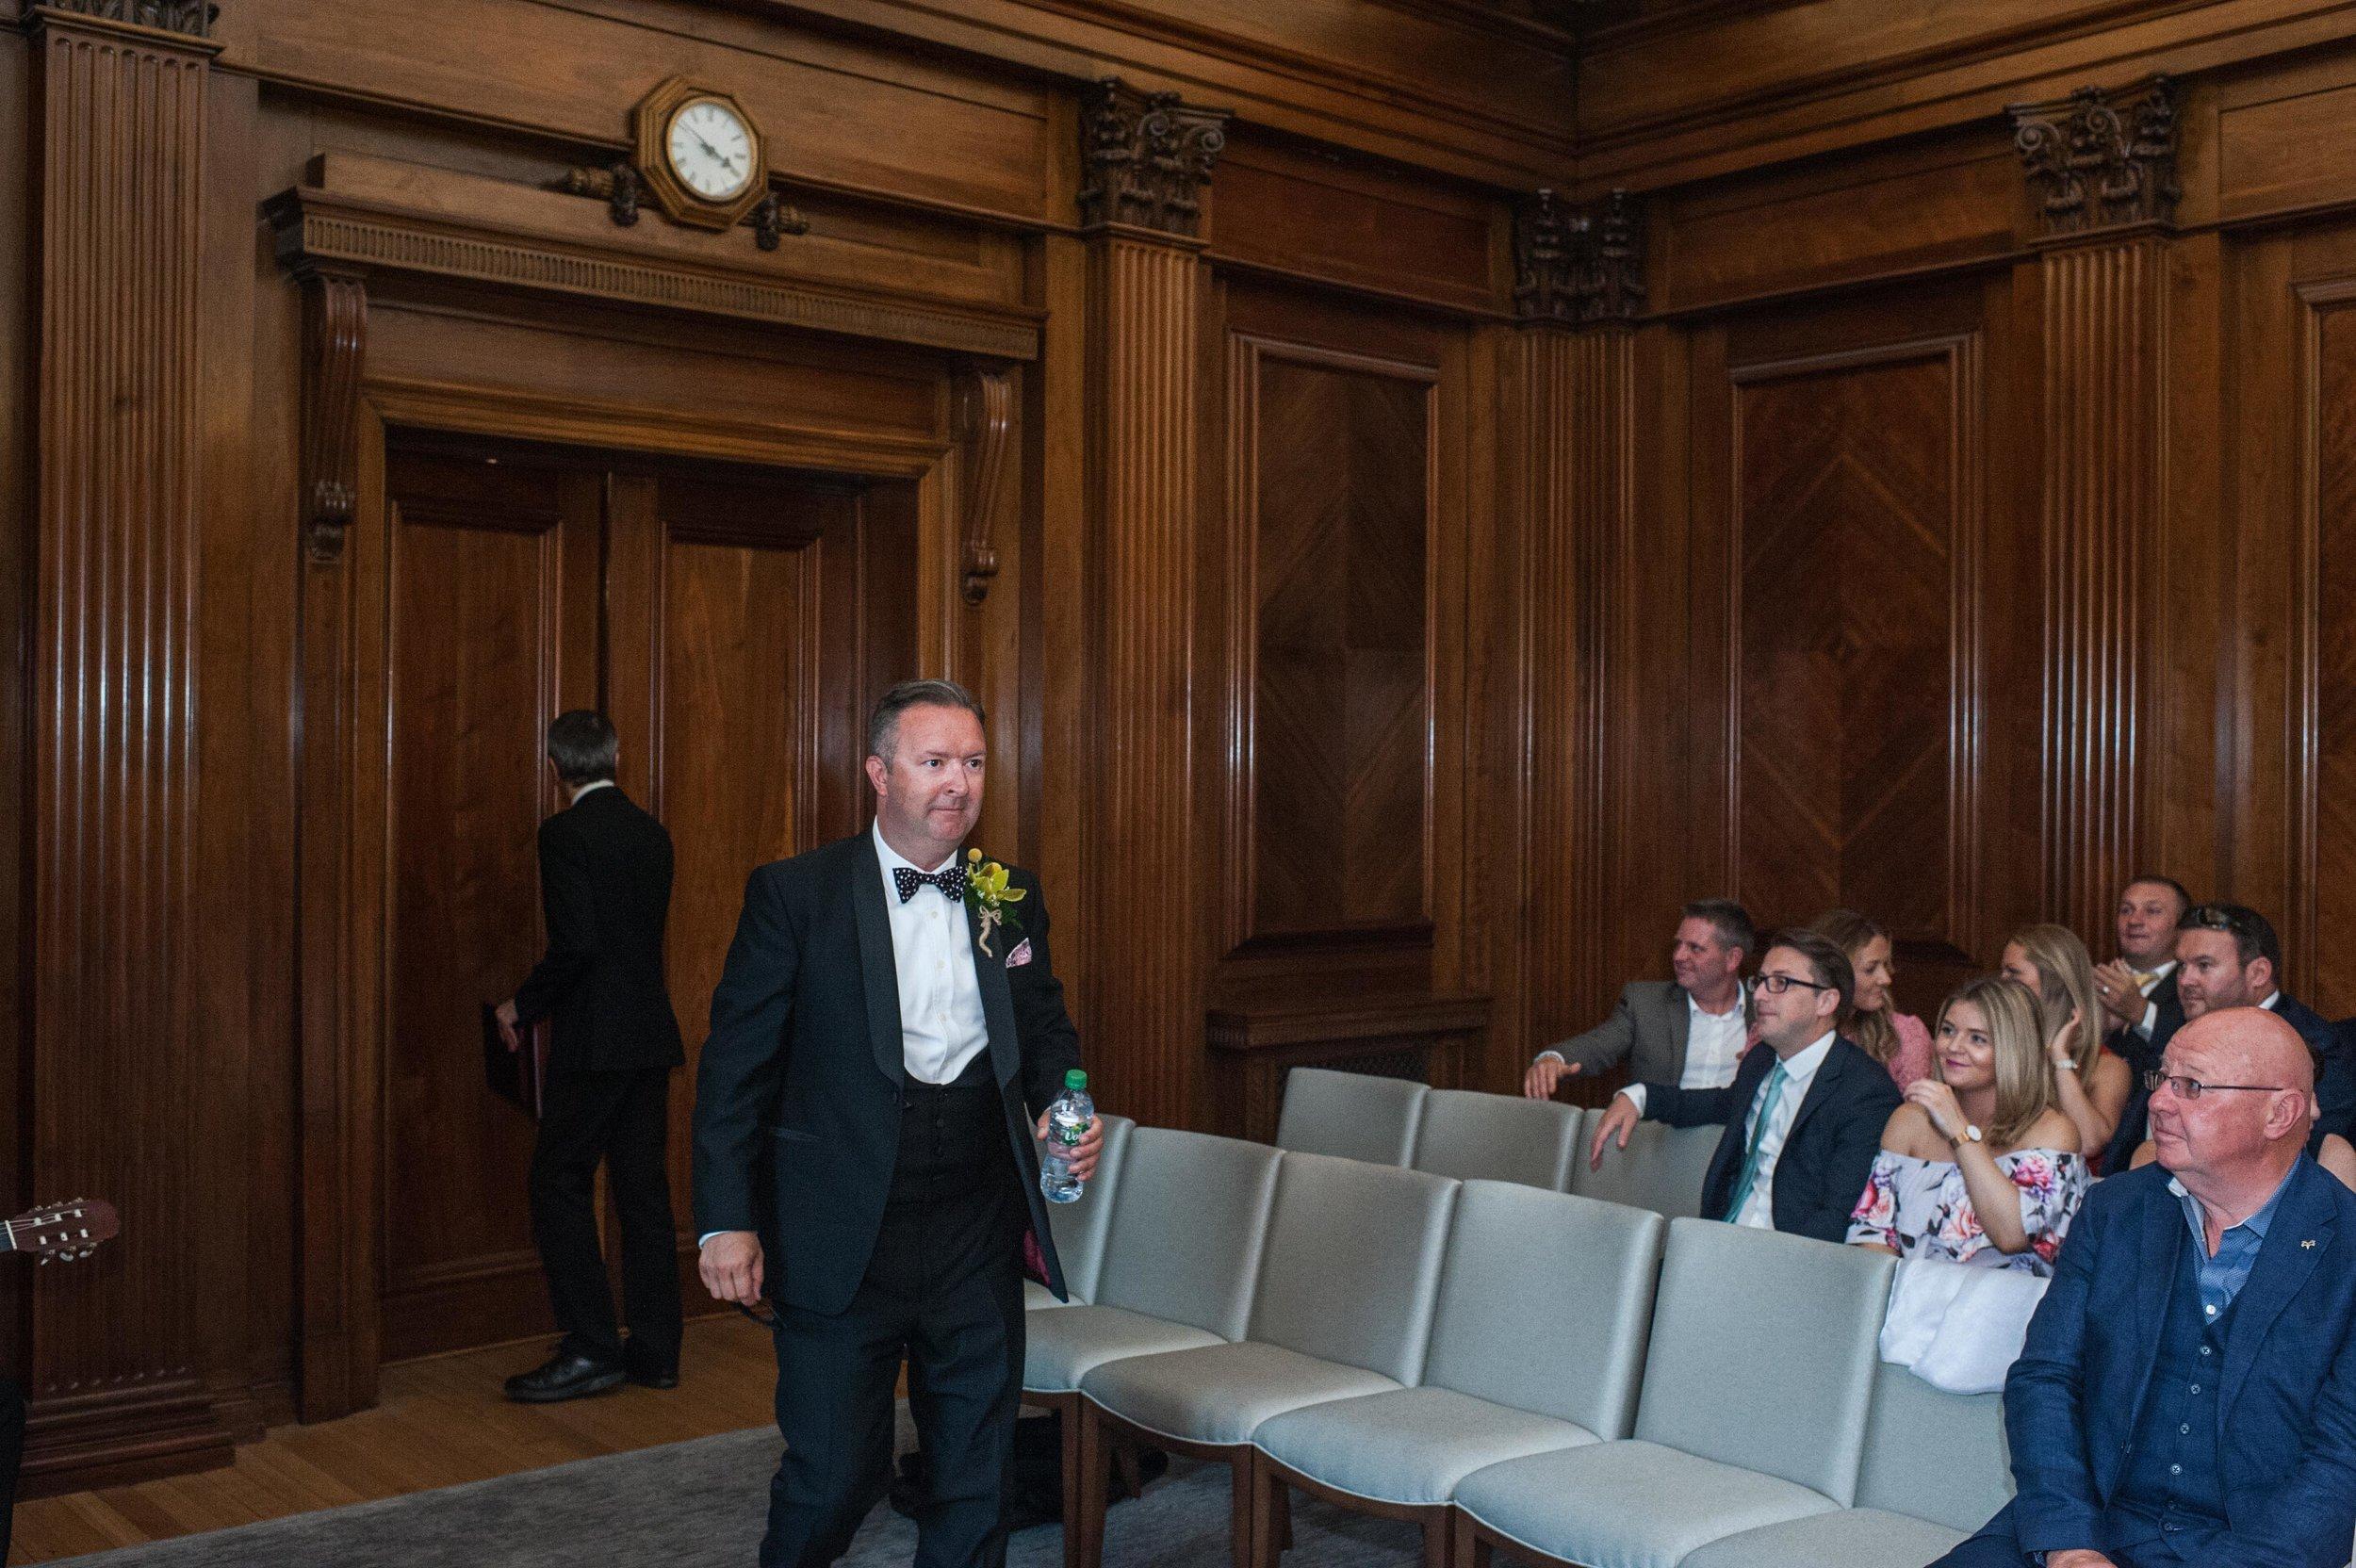 D&M_Marylebone Town Hall Wedding (68 of 239).jpg